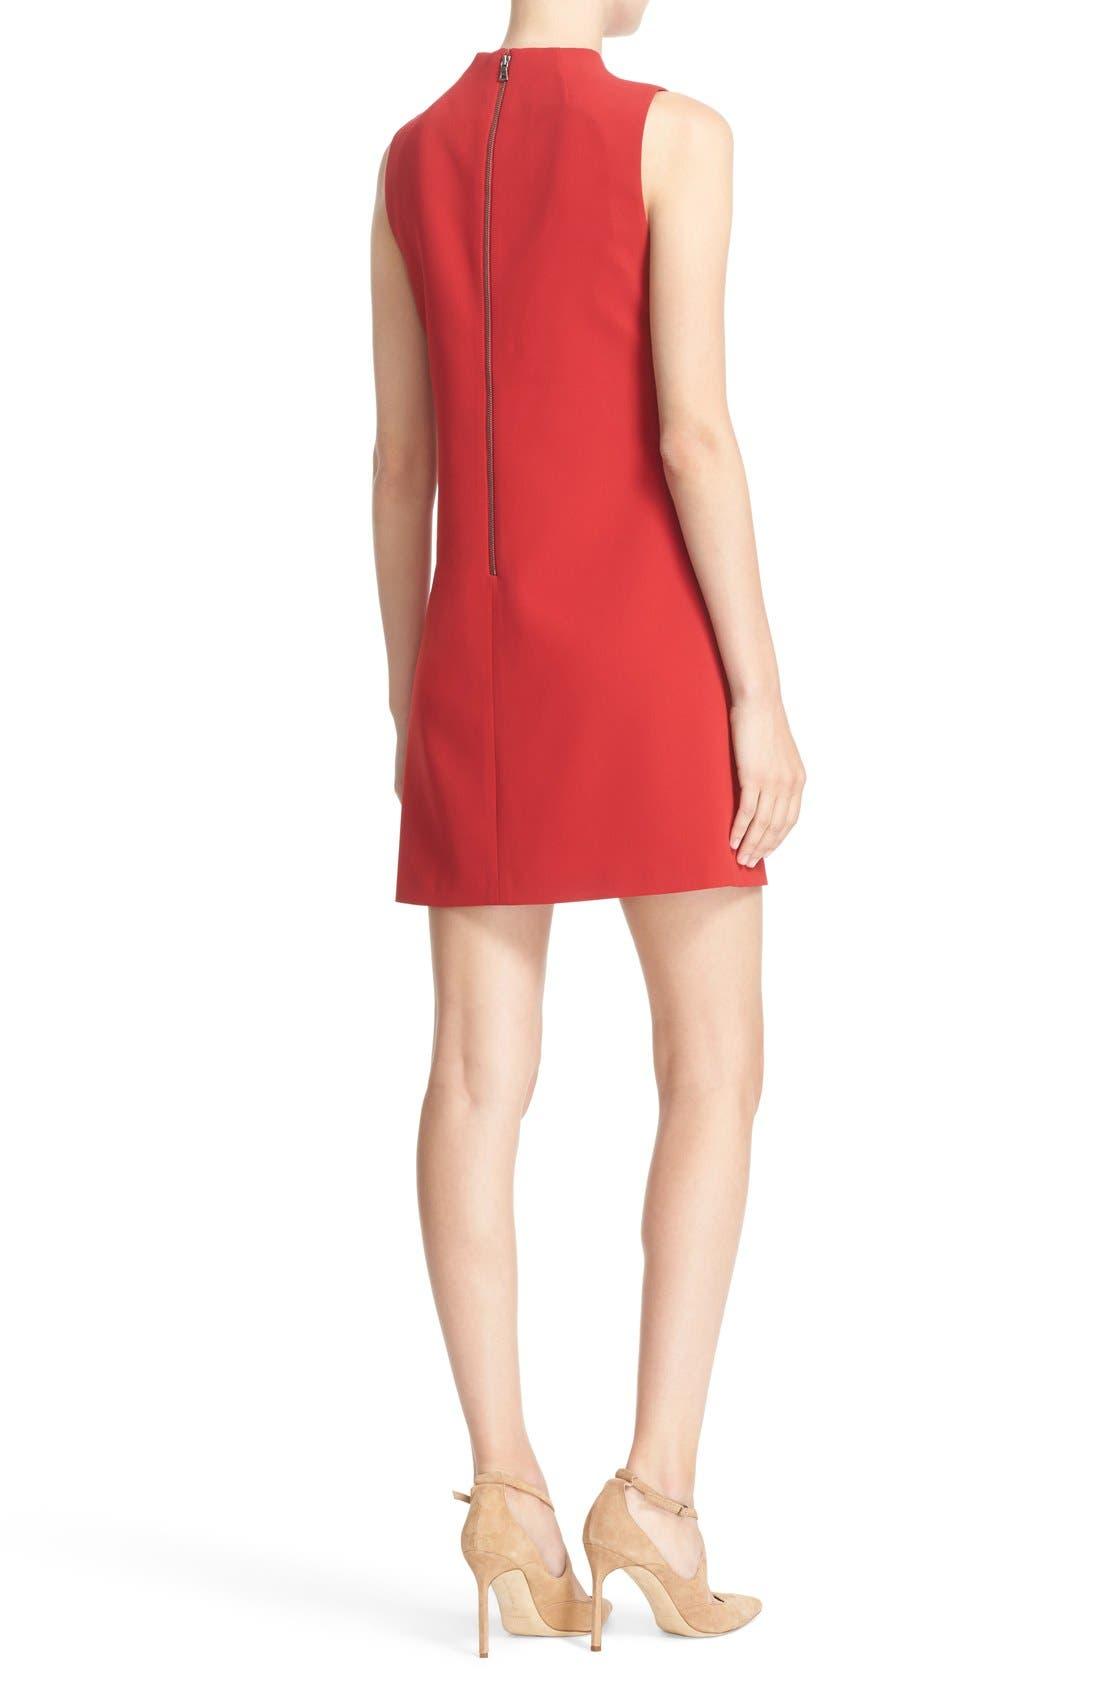 ALICE + OLIVIA,                             'Coley' Mock Neck A-Line Dress,                             Alternate thumbnail 2, color,                             623